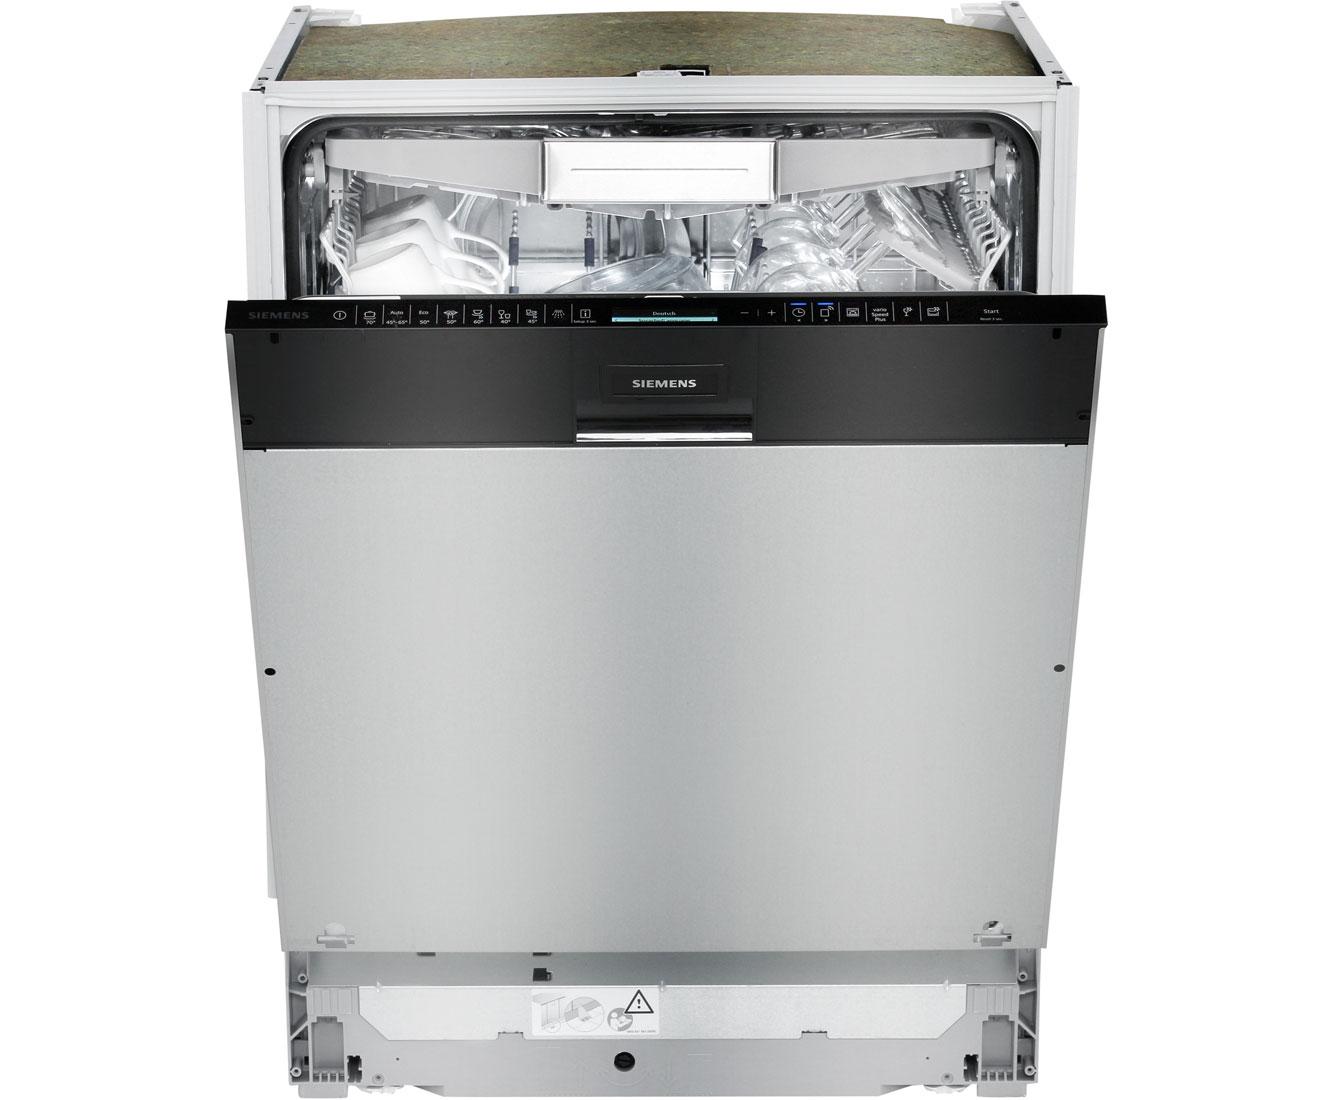 Siemens Spulmaschine Zeolith Zeolith Geschirrspuler Schon Bosch